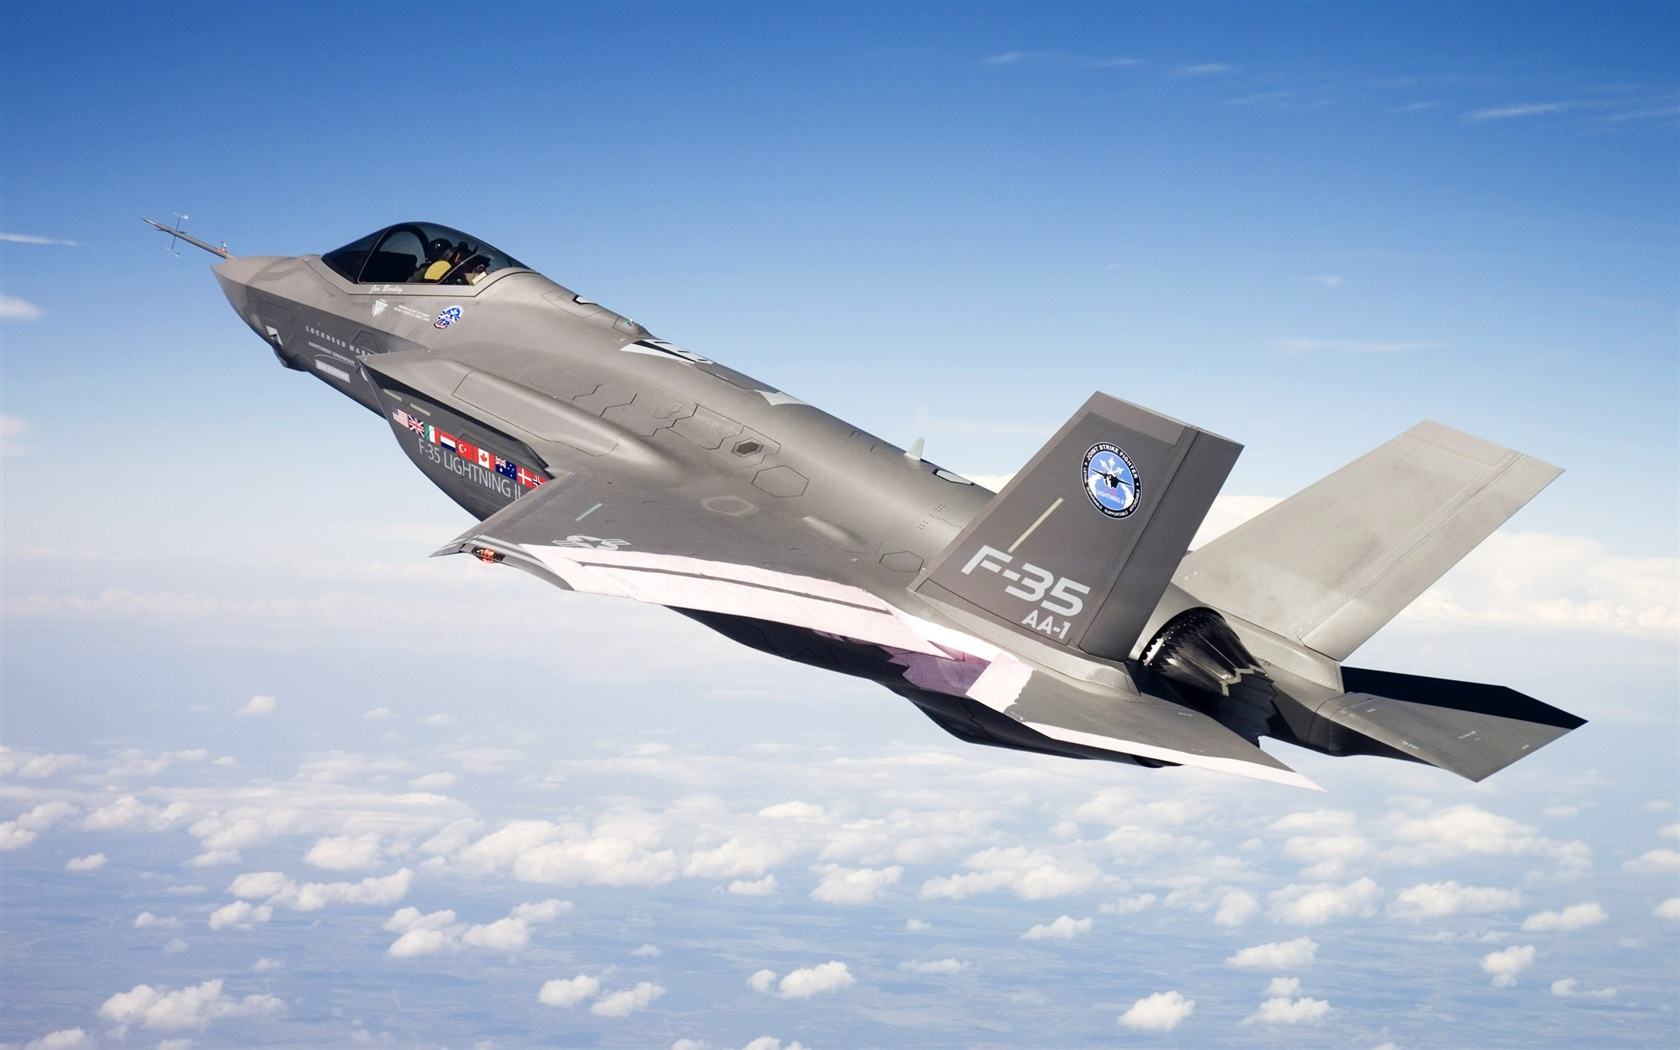 F 35 (戦闘機)の画像 p1_37